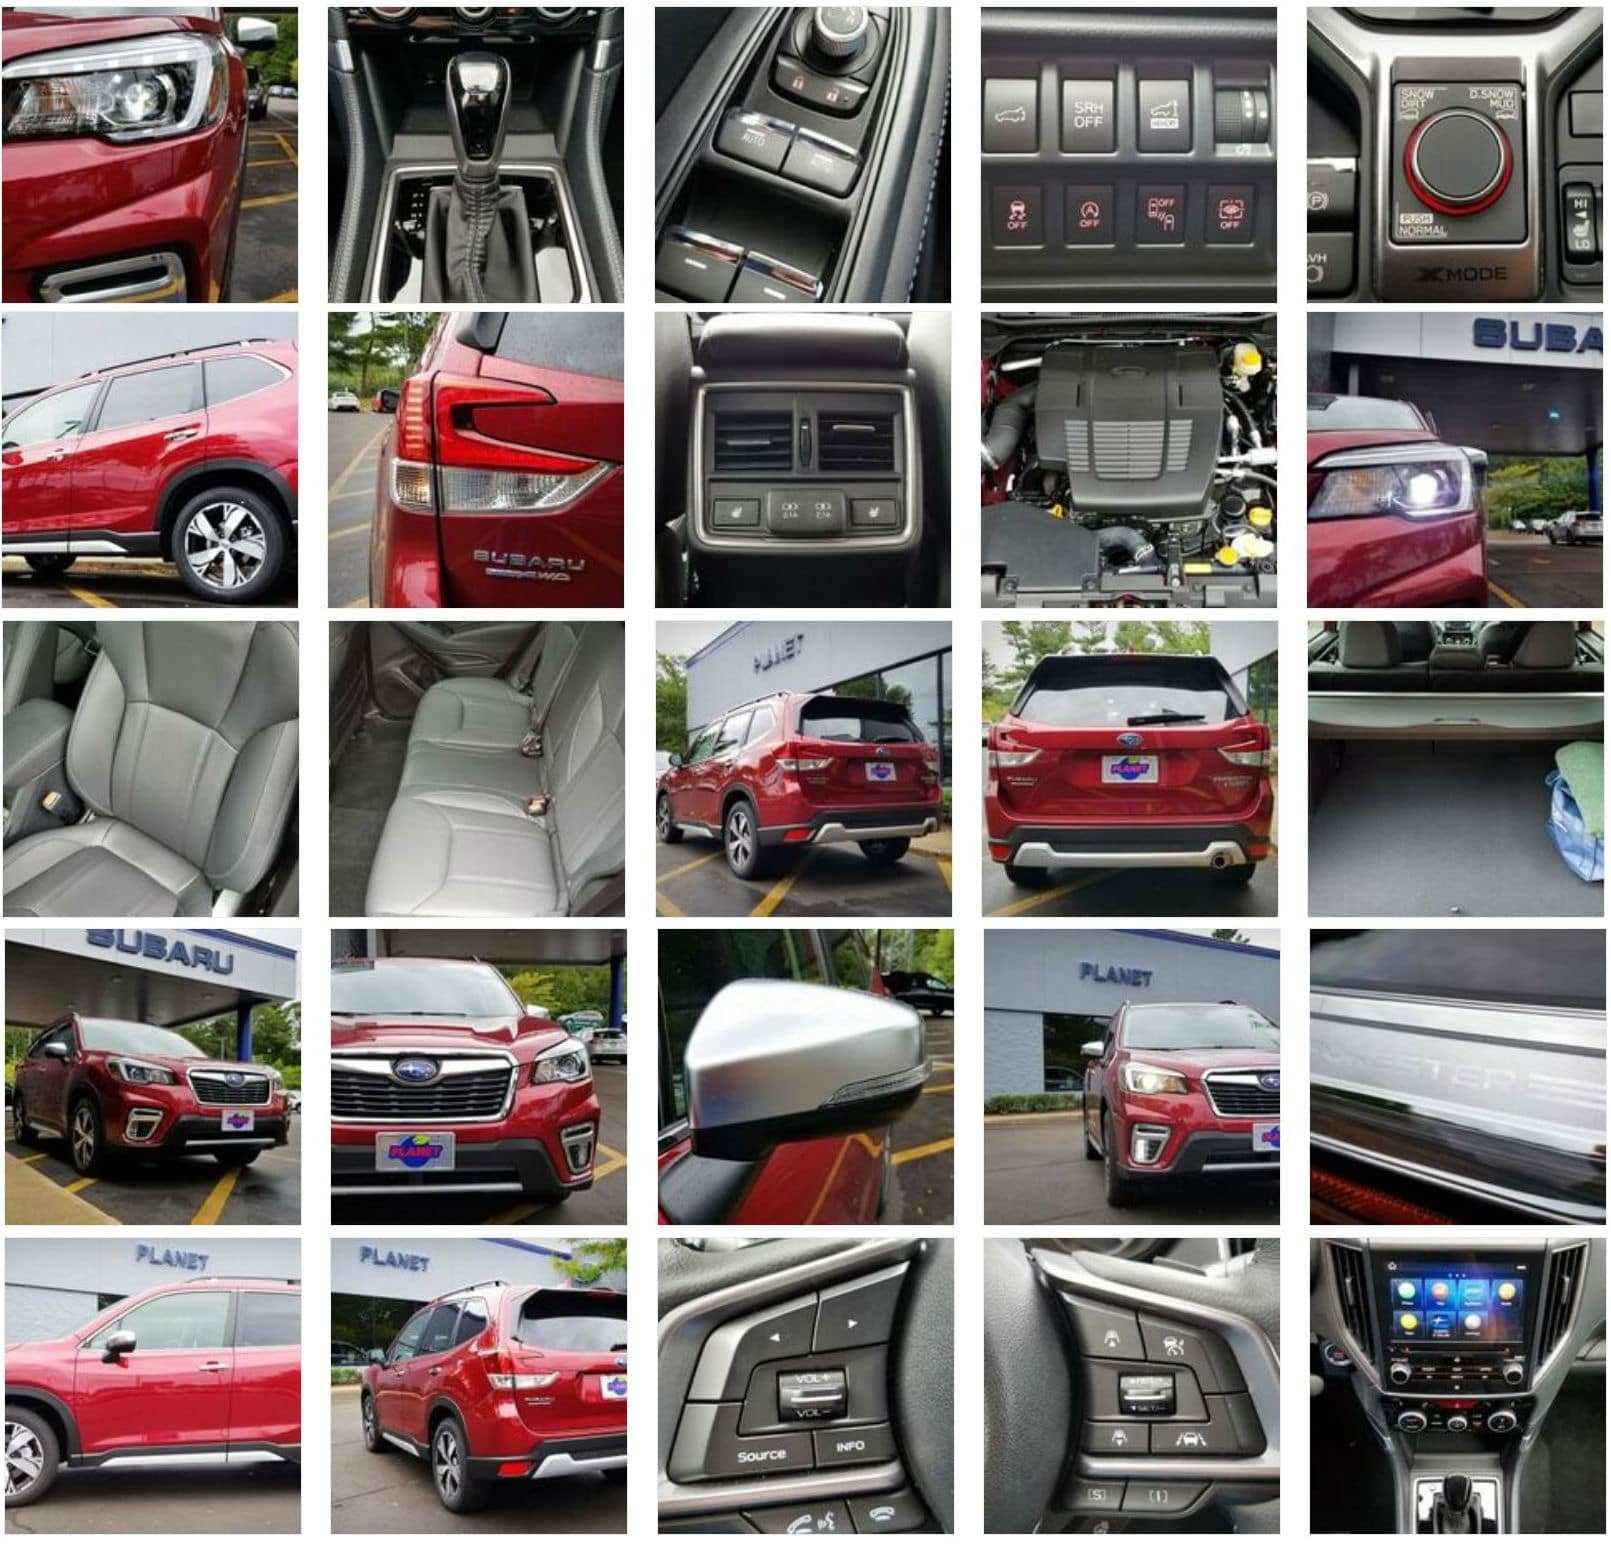 74 New 2019 Subaru Forester Debut Interior for 2019 Subaru Forester Debut